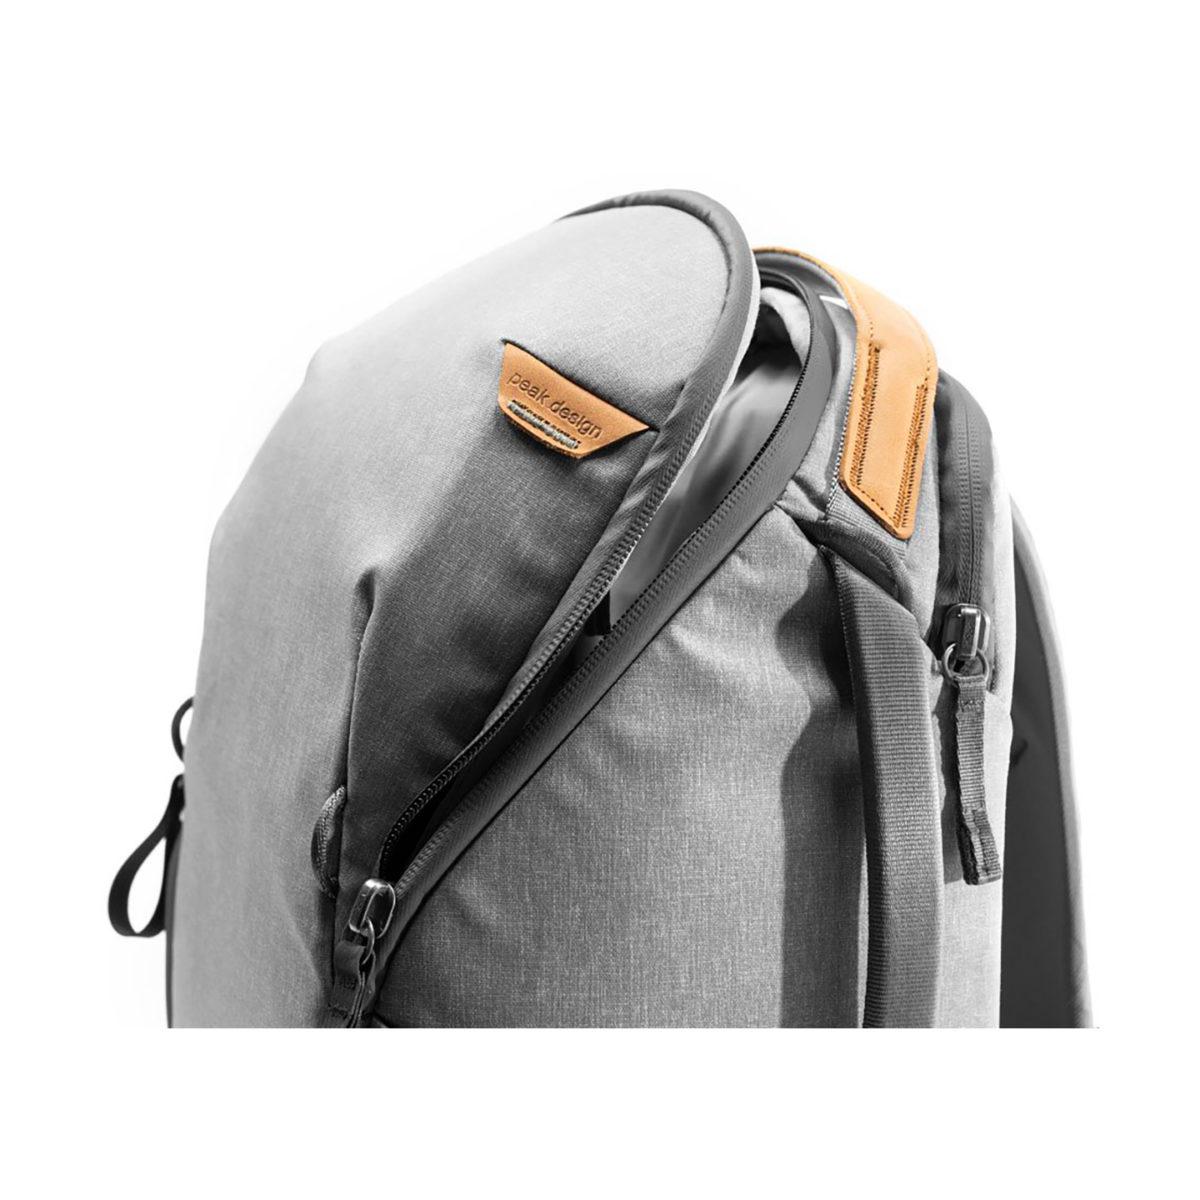 peak_design_everyday_backpack_zip_v2_05